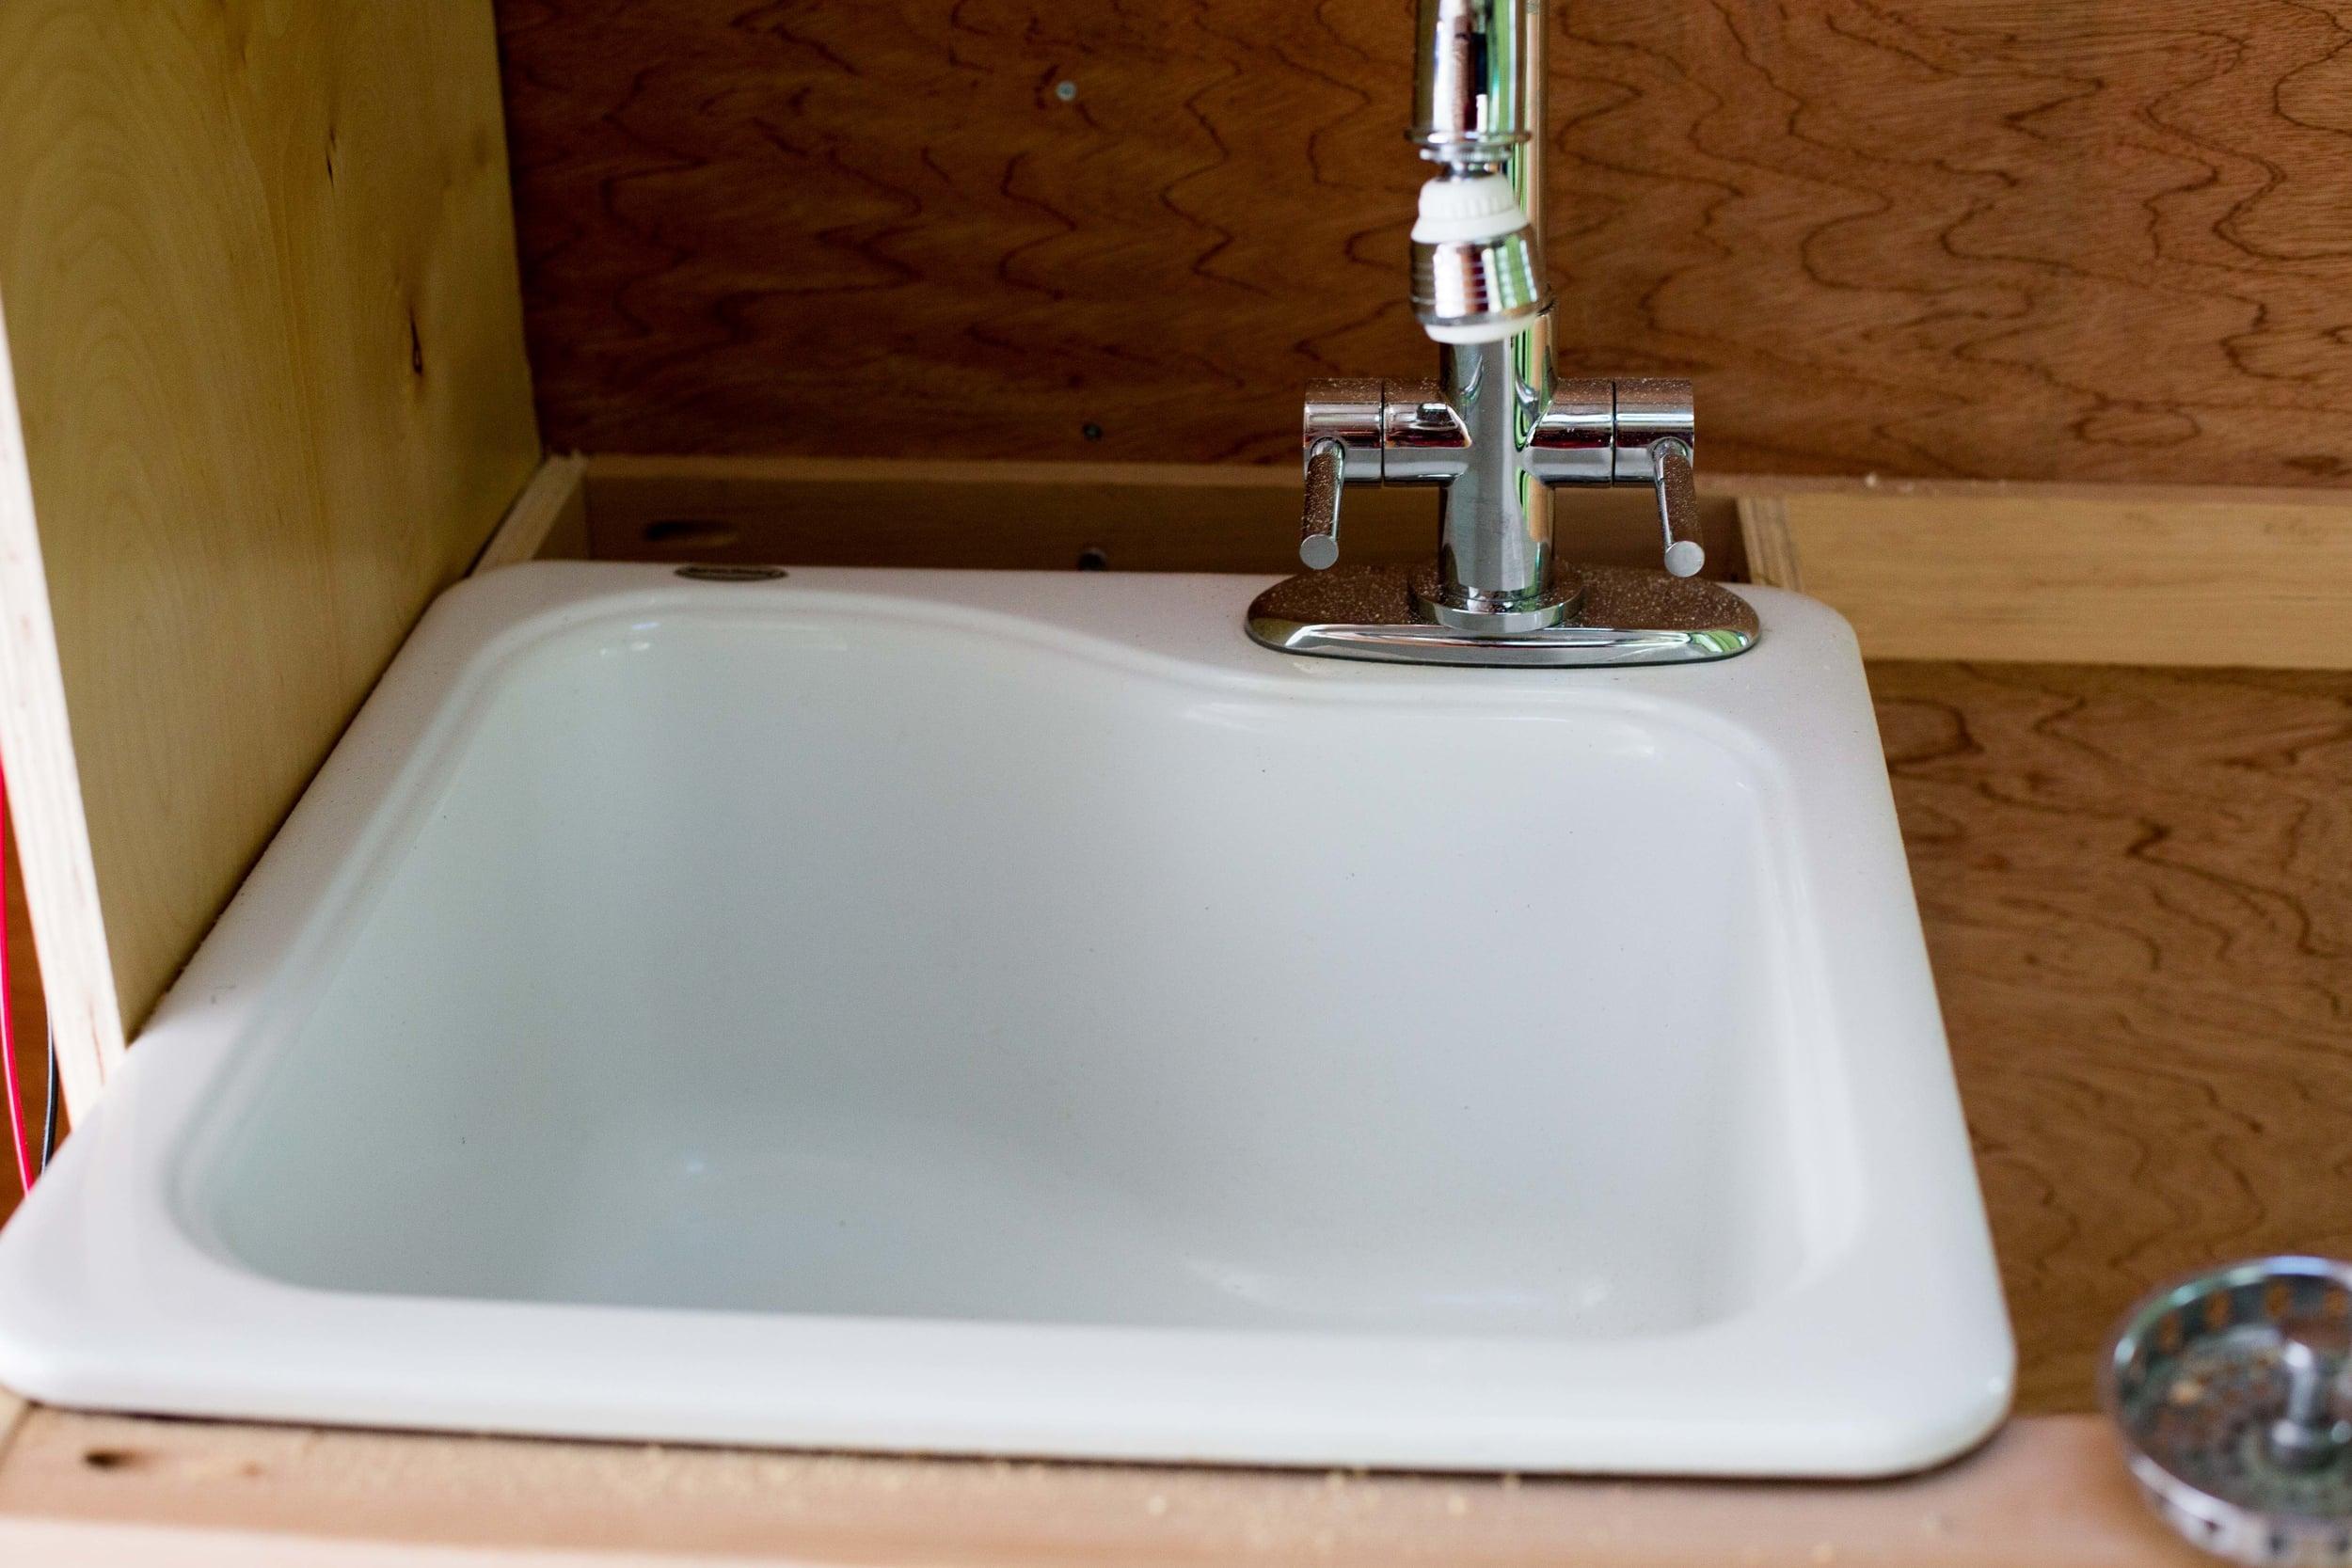 White Americast sink